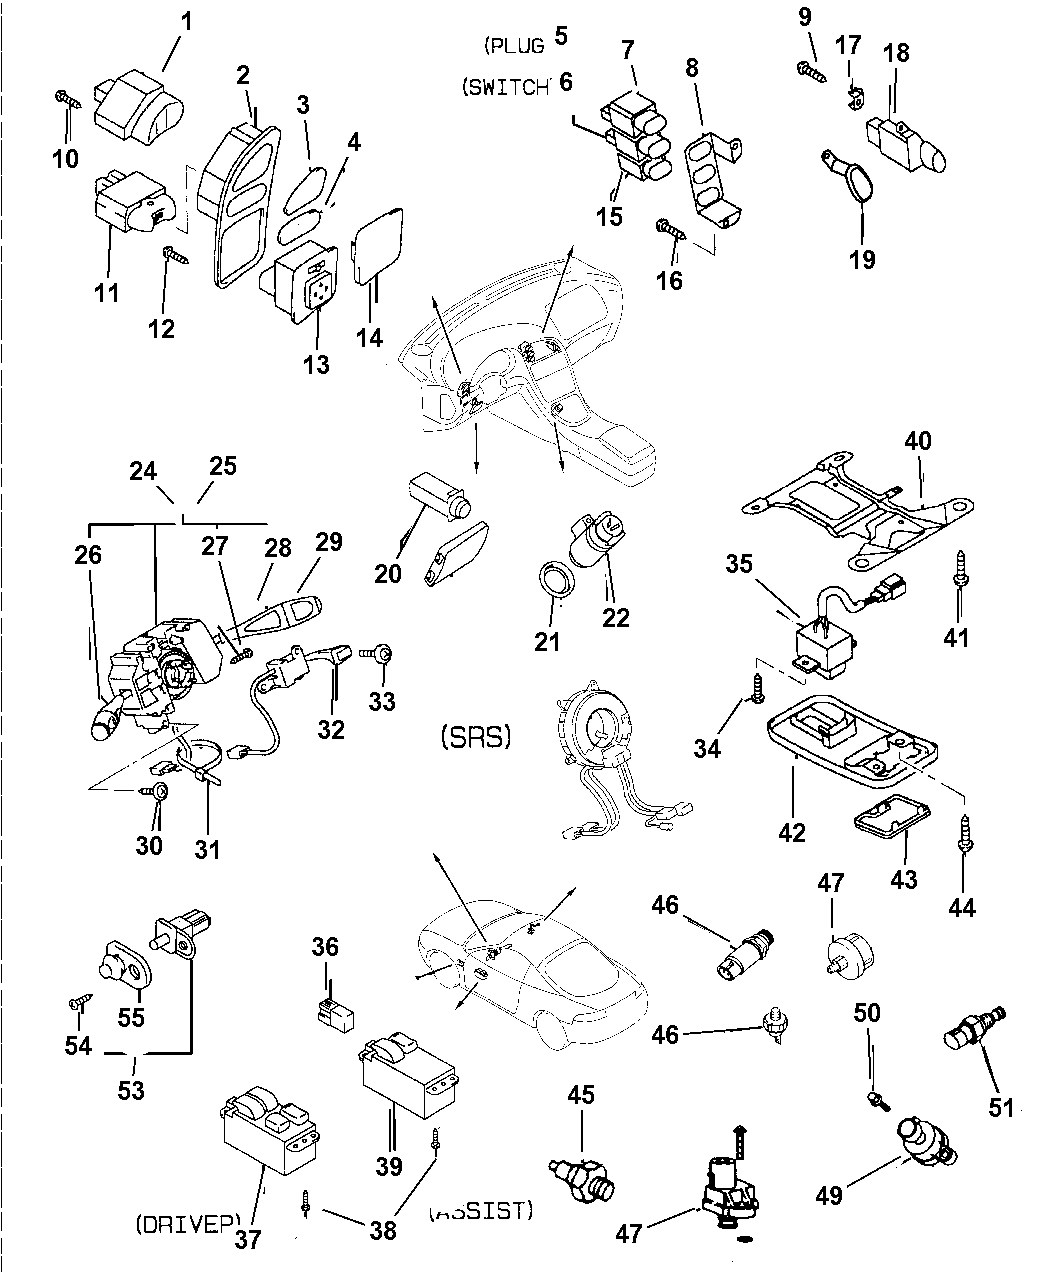 md138993